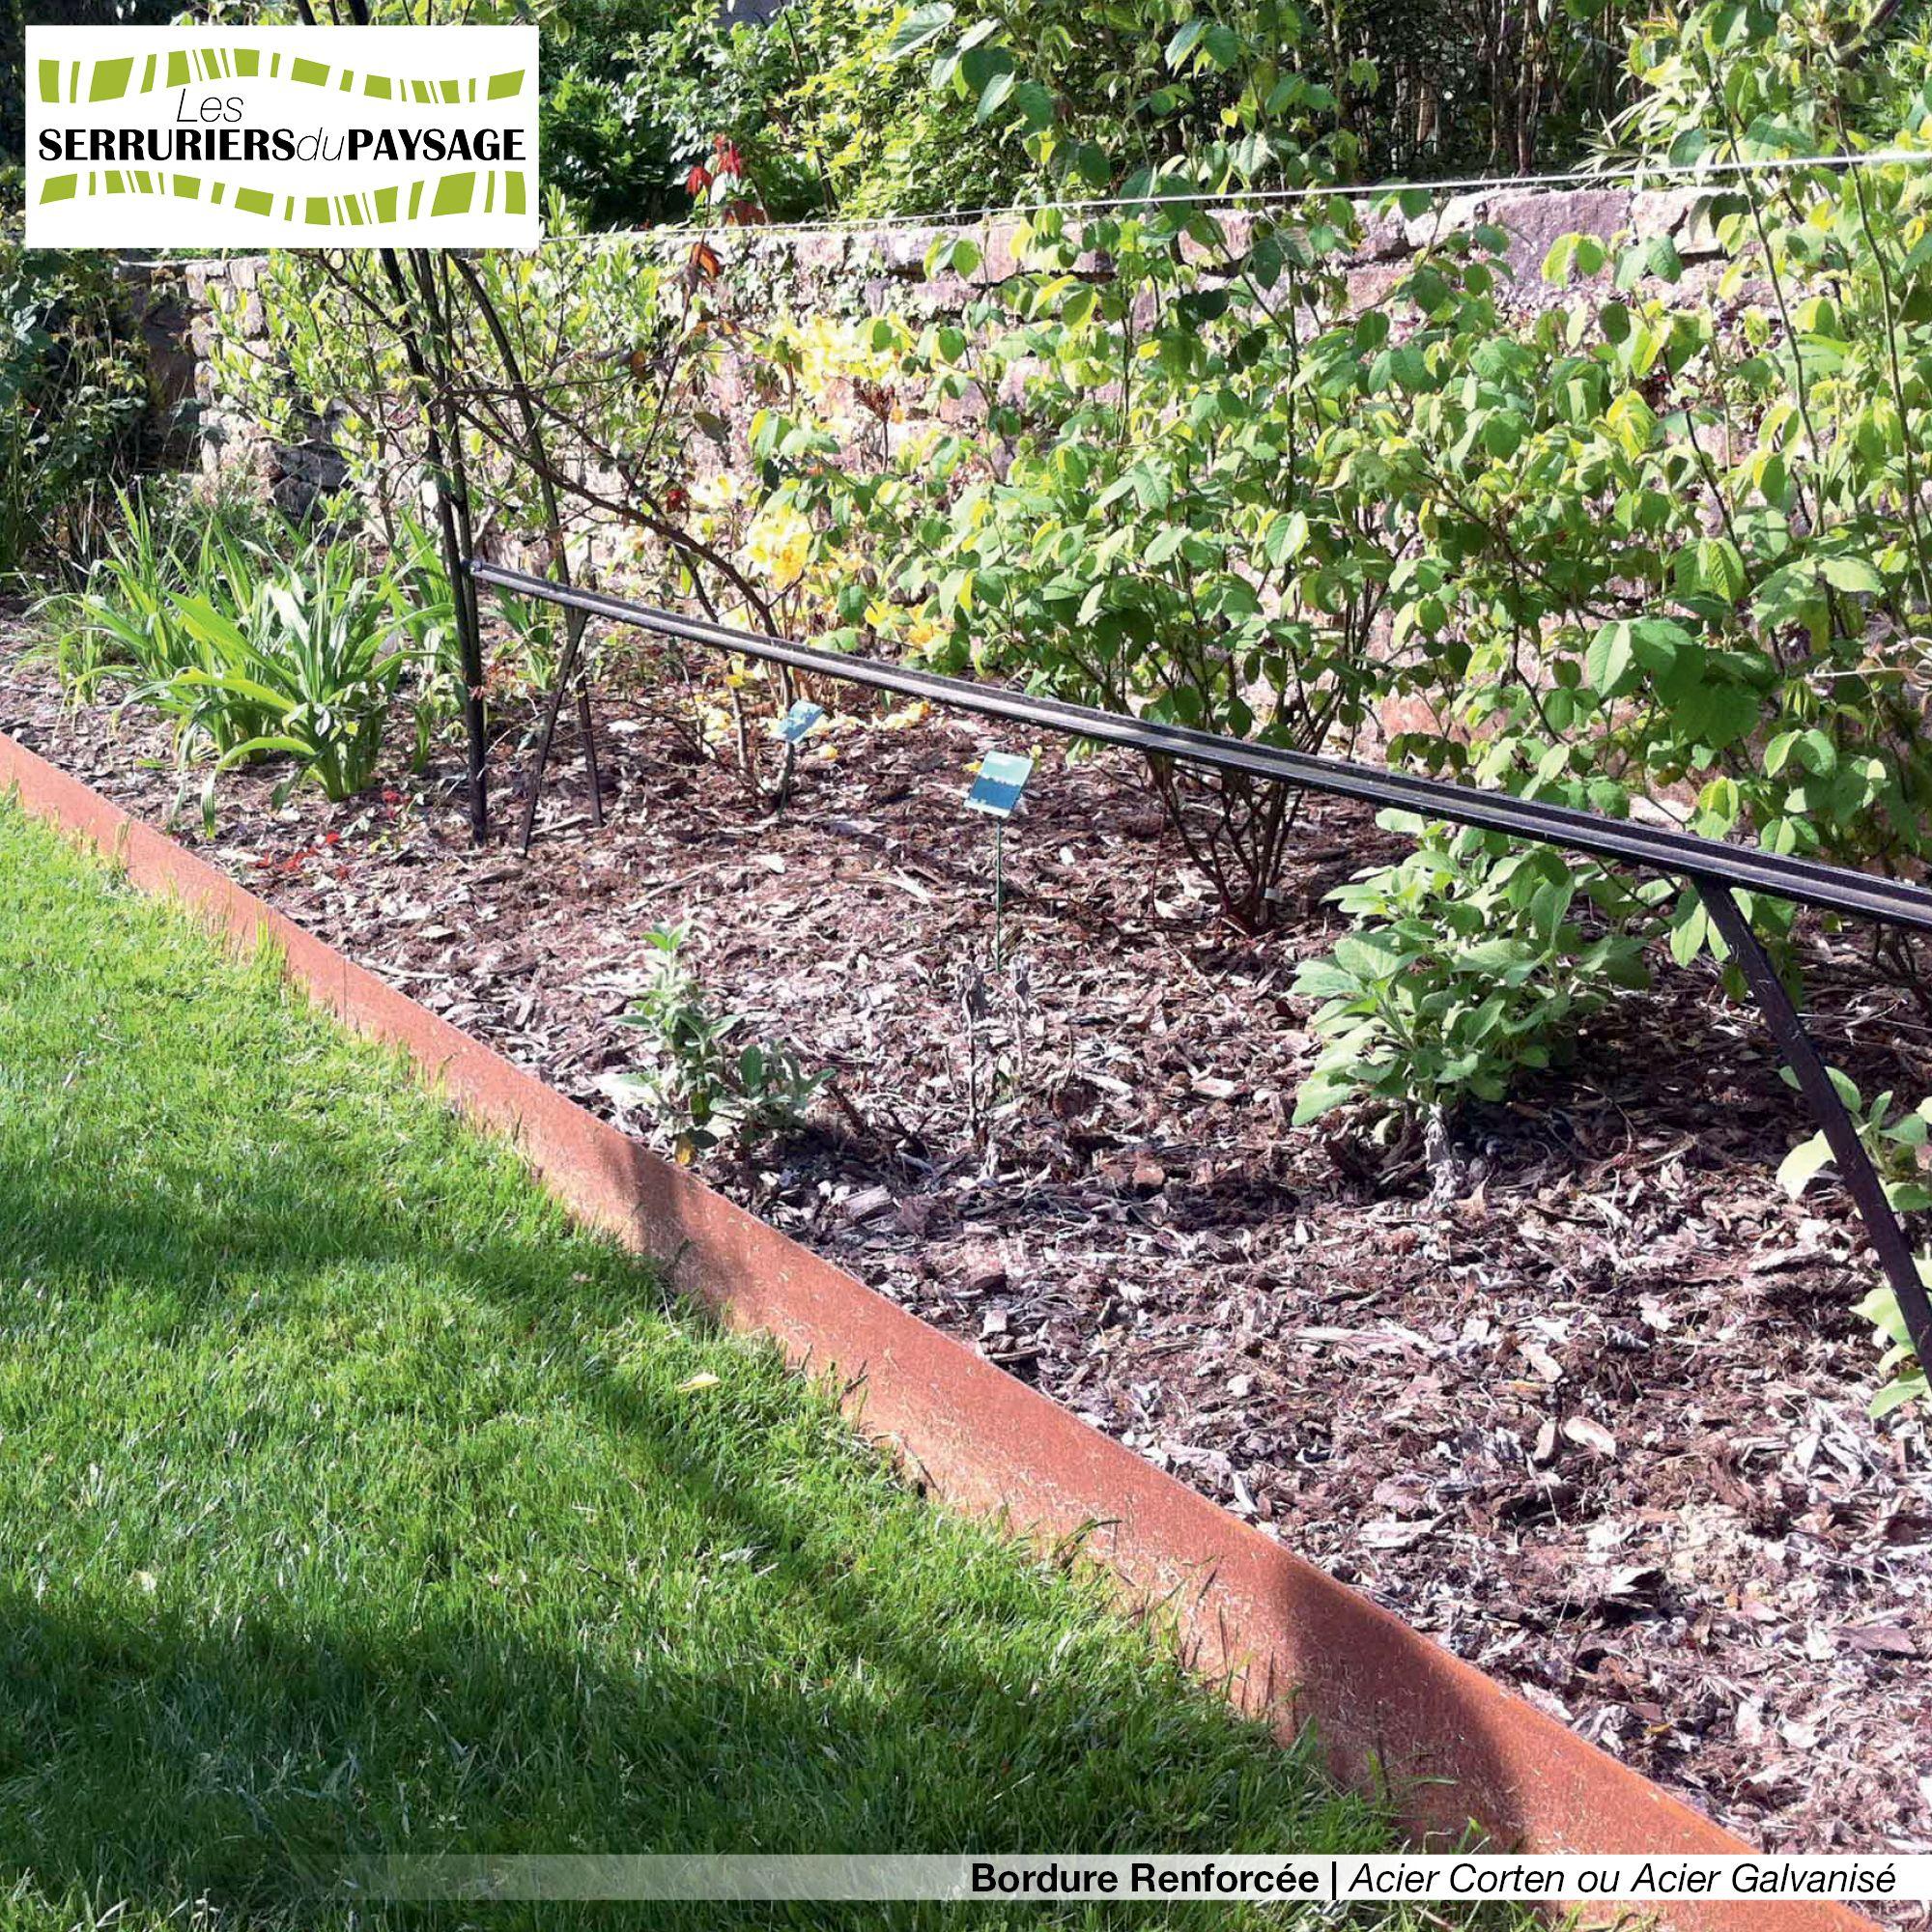 Bordure De Jardin En Tôle Acier Galvanisé Ou Tôle Acier ... avec Bordure De Jardin En Acier Galvanisé